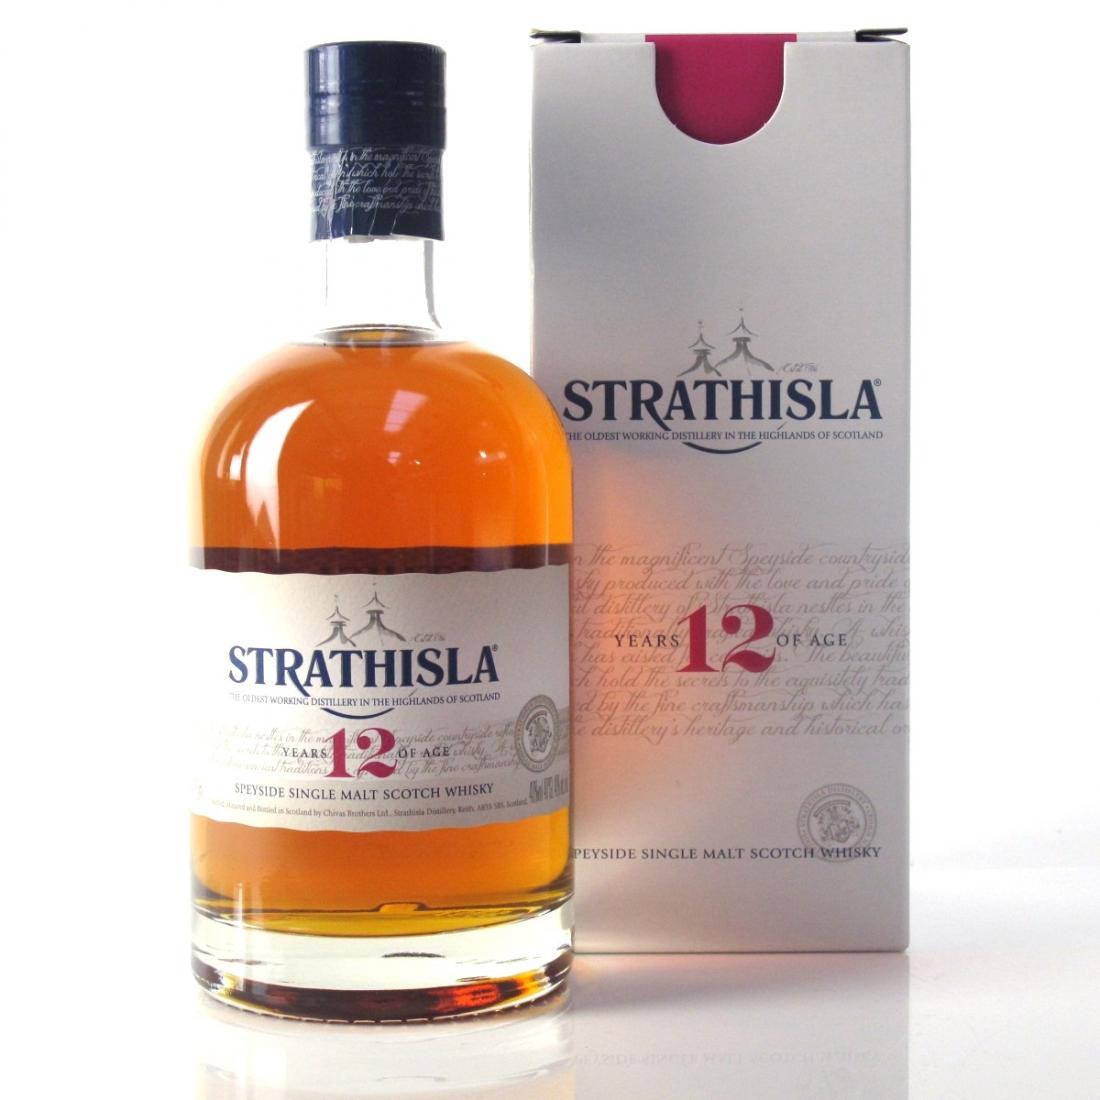 Strathisla 12 Year Old